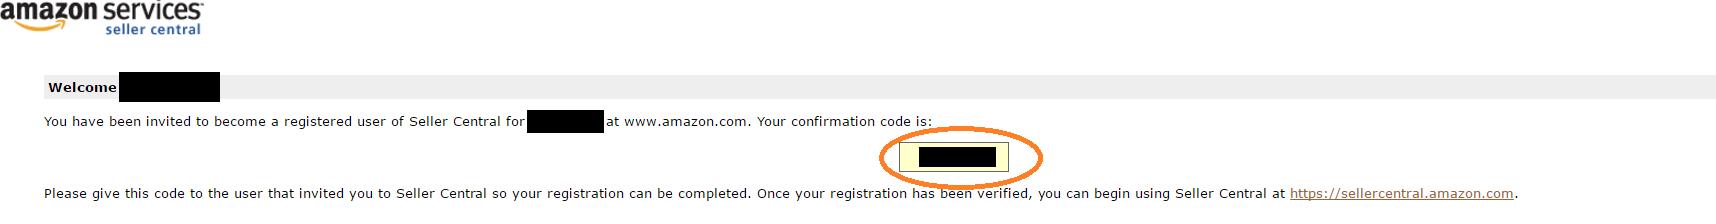 Amazon輸出アクセス権限付与方法